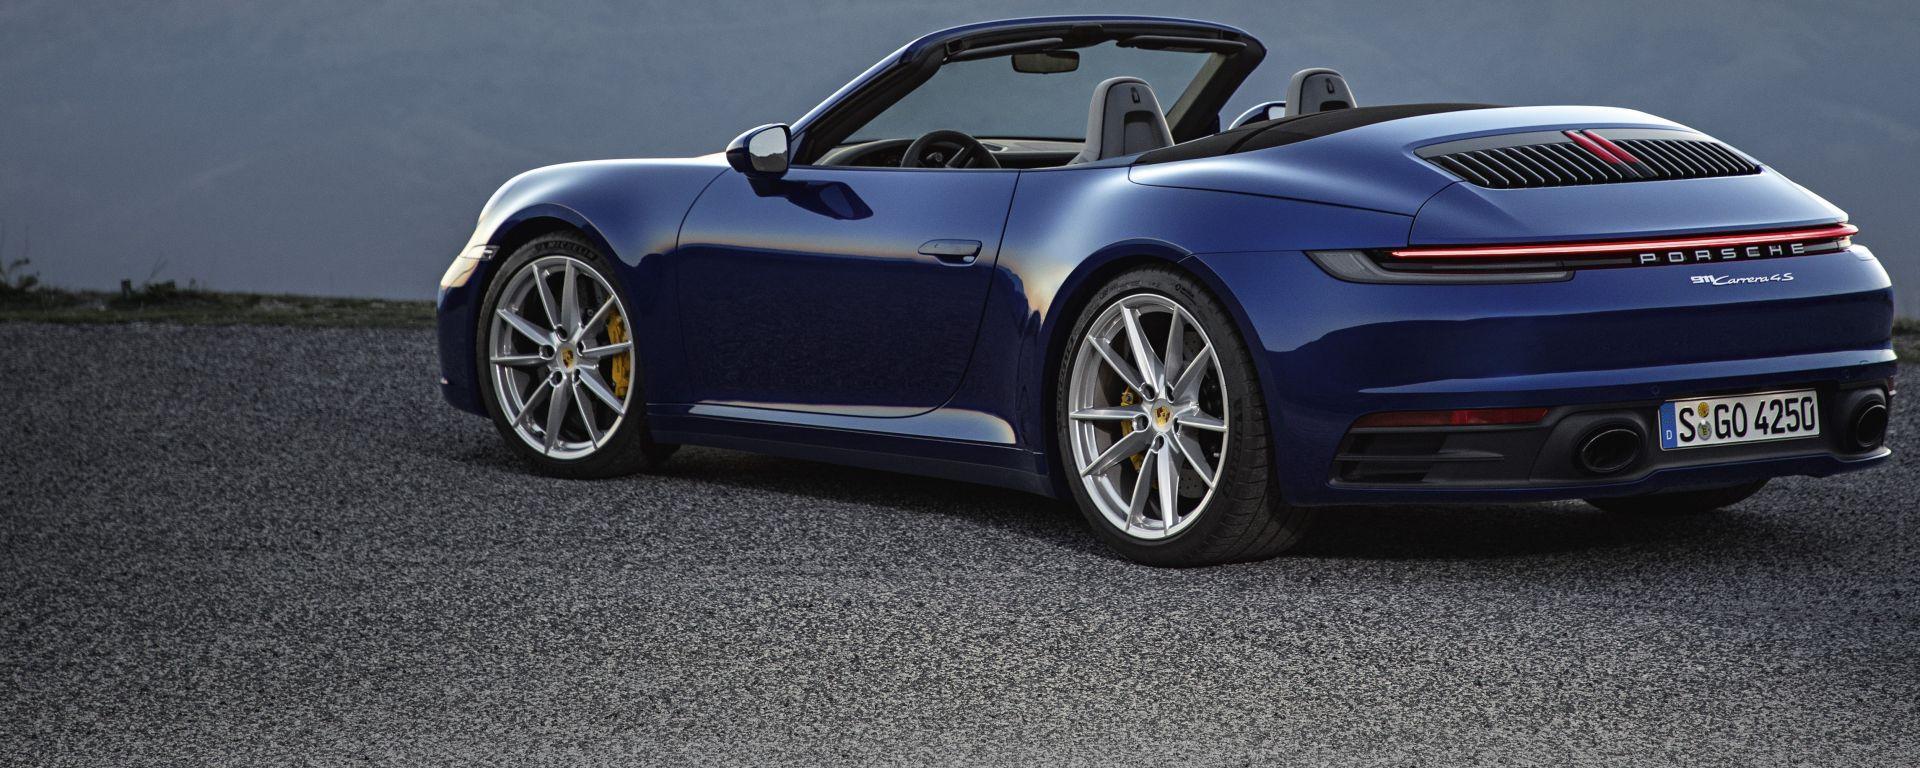 Nuova Porsche 911 Cabriolet 2019